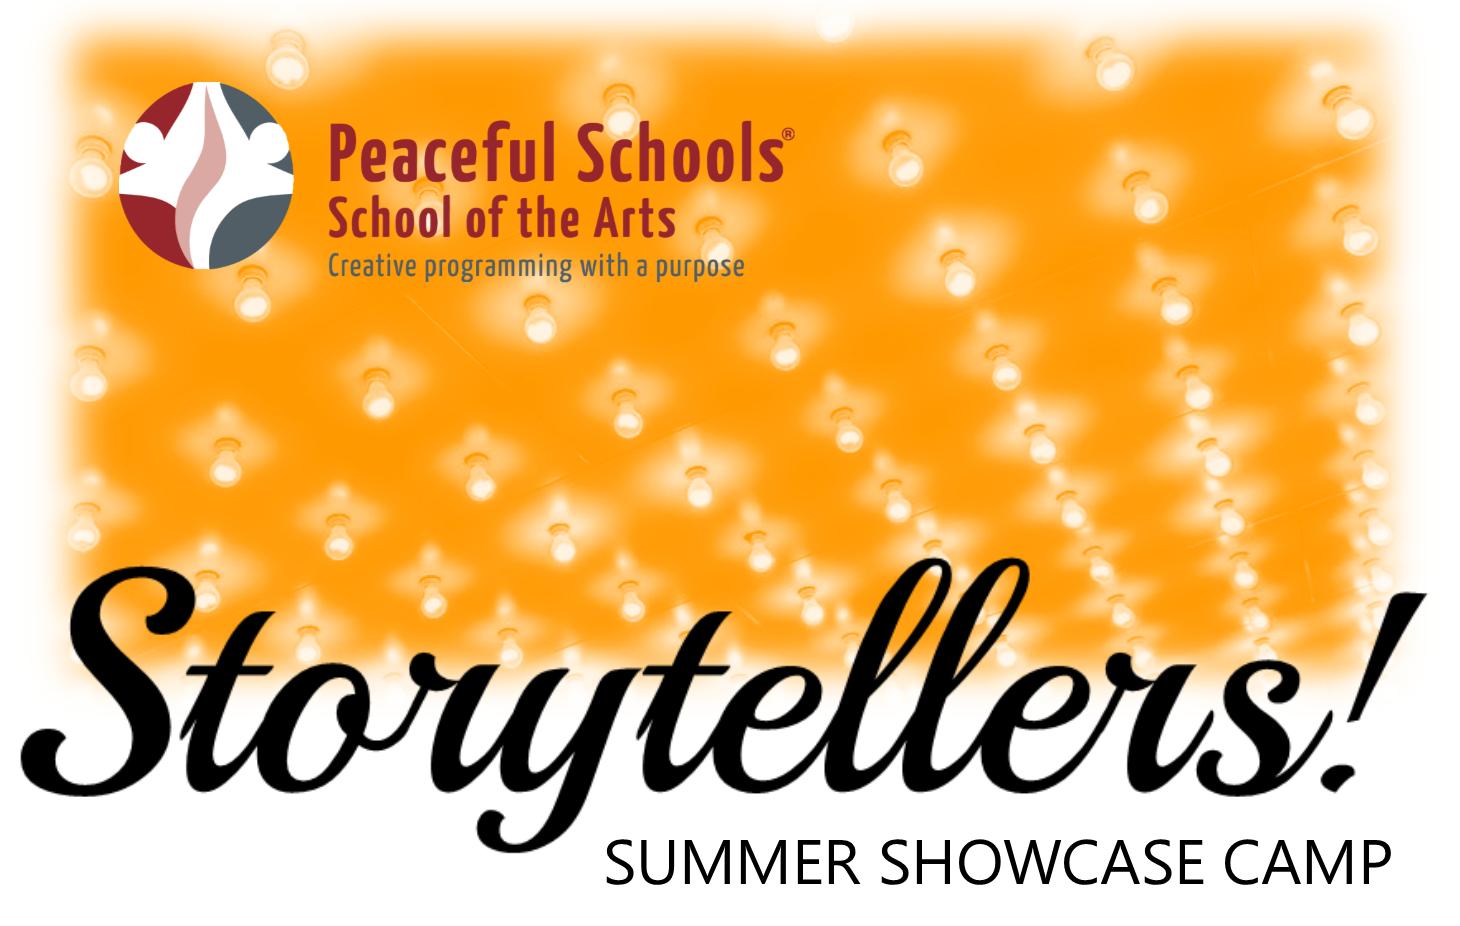 Summer Storytellers Showcase Camp!